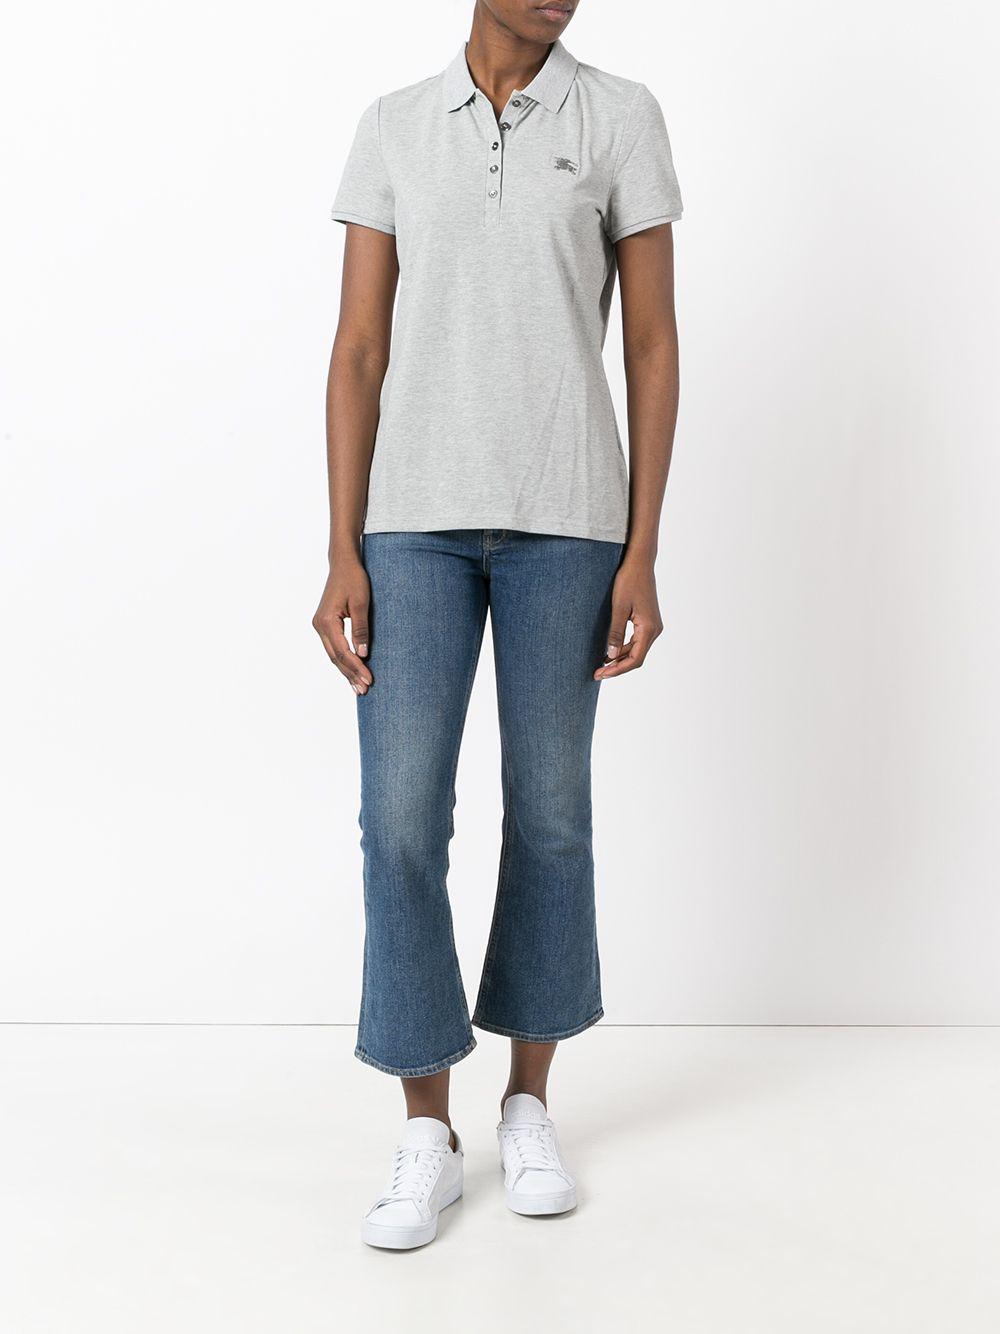 Grey cotton blend embroidered Burberry logo polo shirt BURBERRY |  | 3955949-YNG85118GRIGIO CHIARO